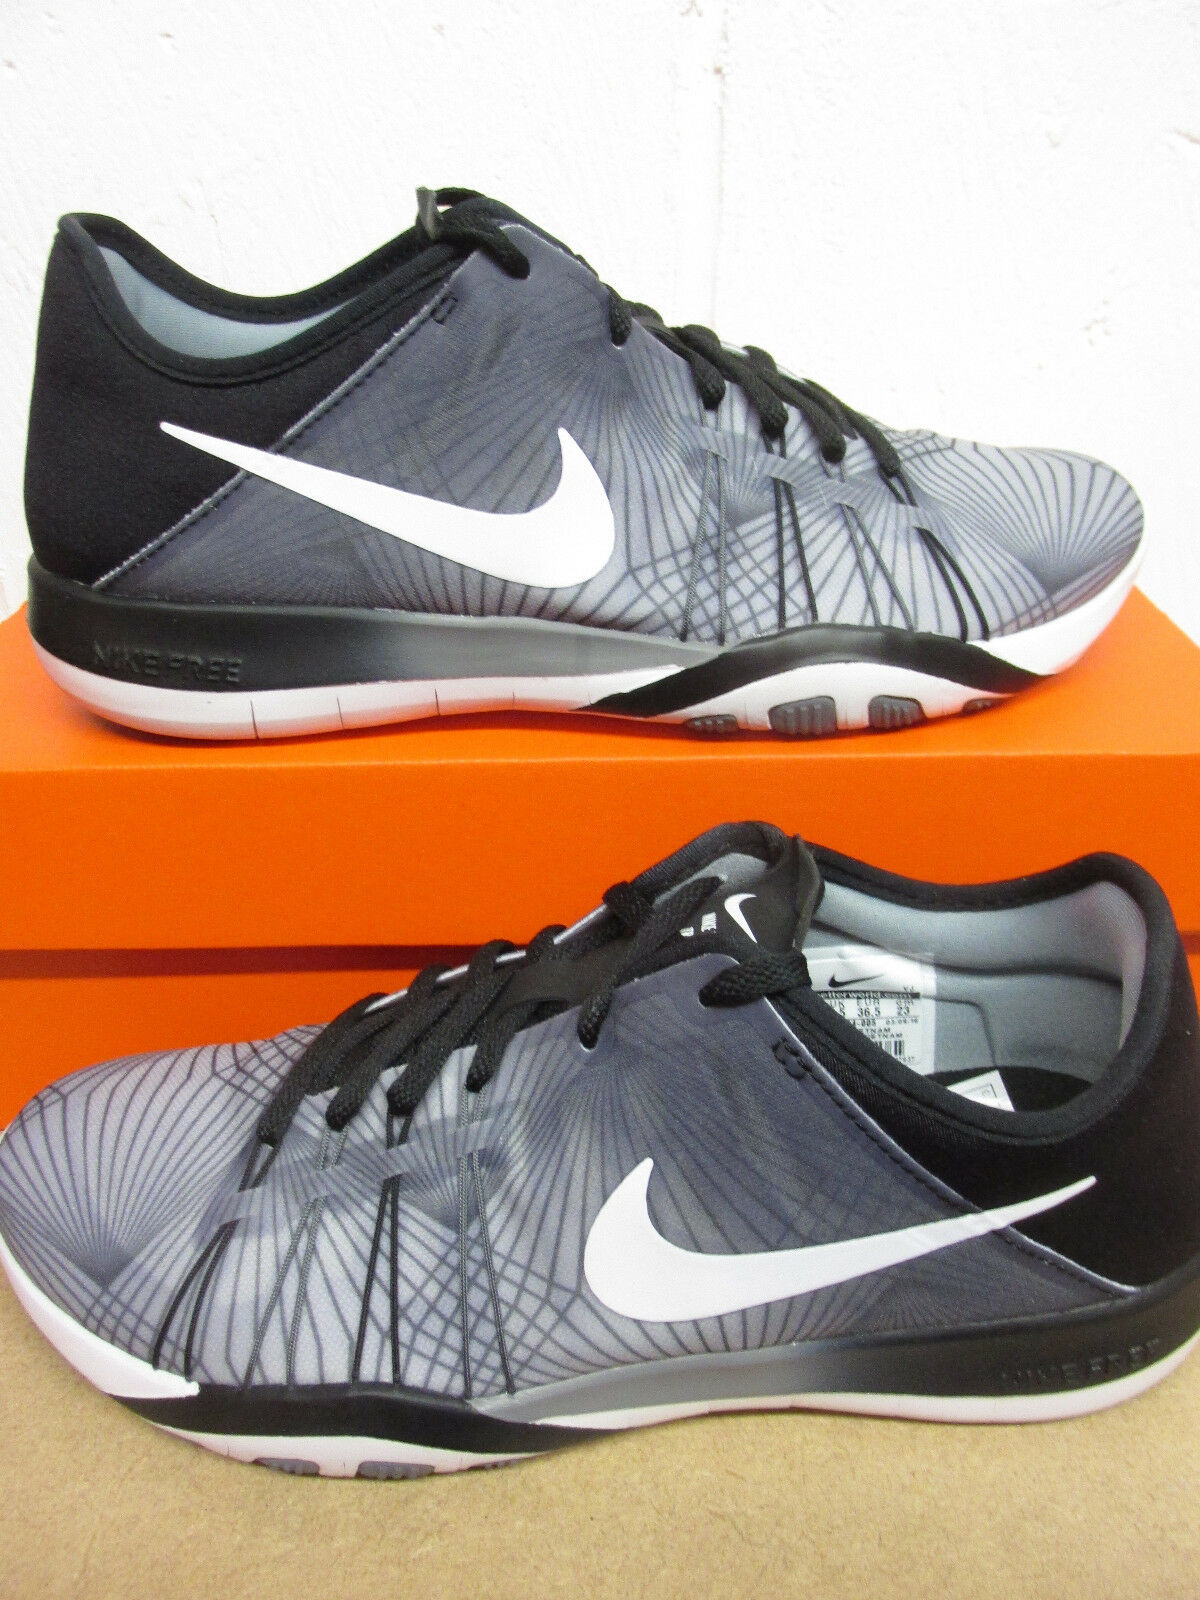 Nike PRT femmes Free TR 6 PRT Nike Running Trainers 833424 005 Baskets Chaussures b2a71c